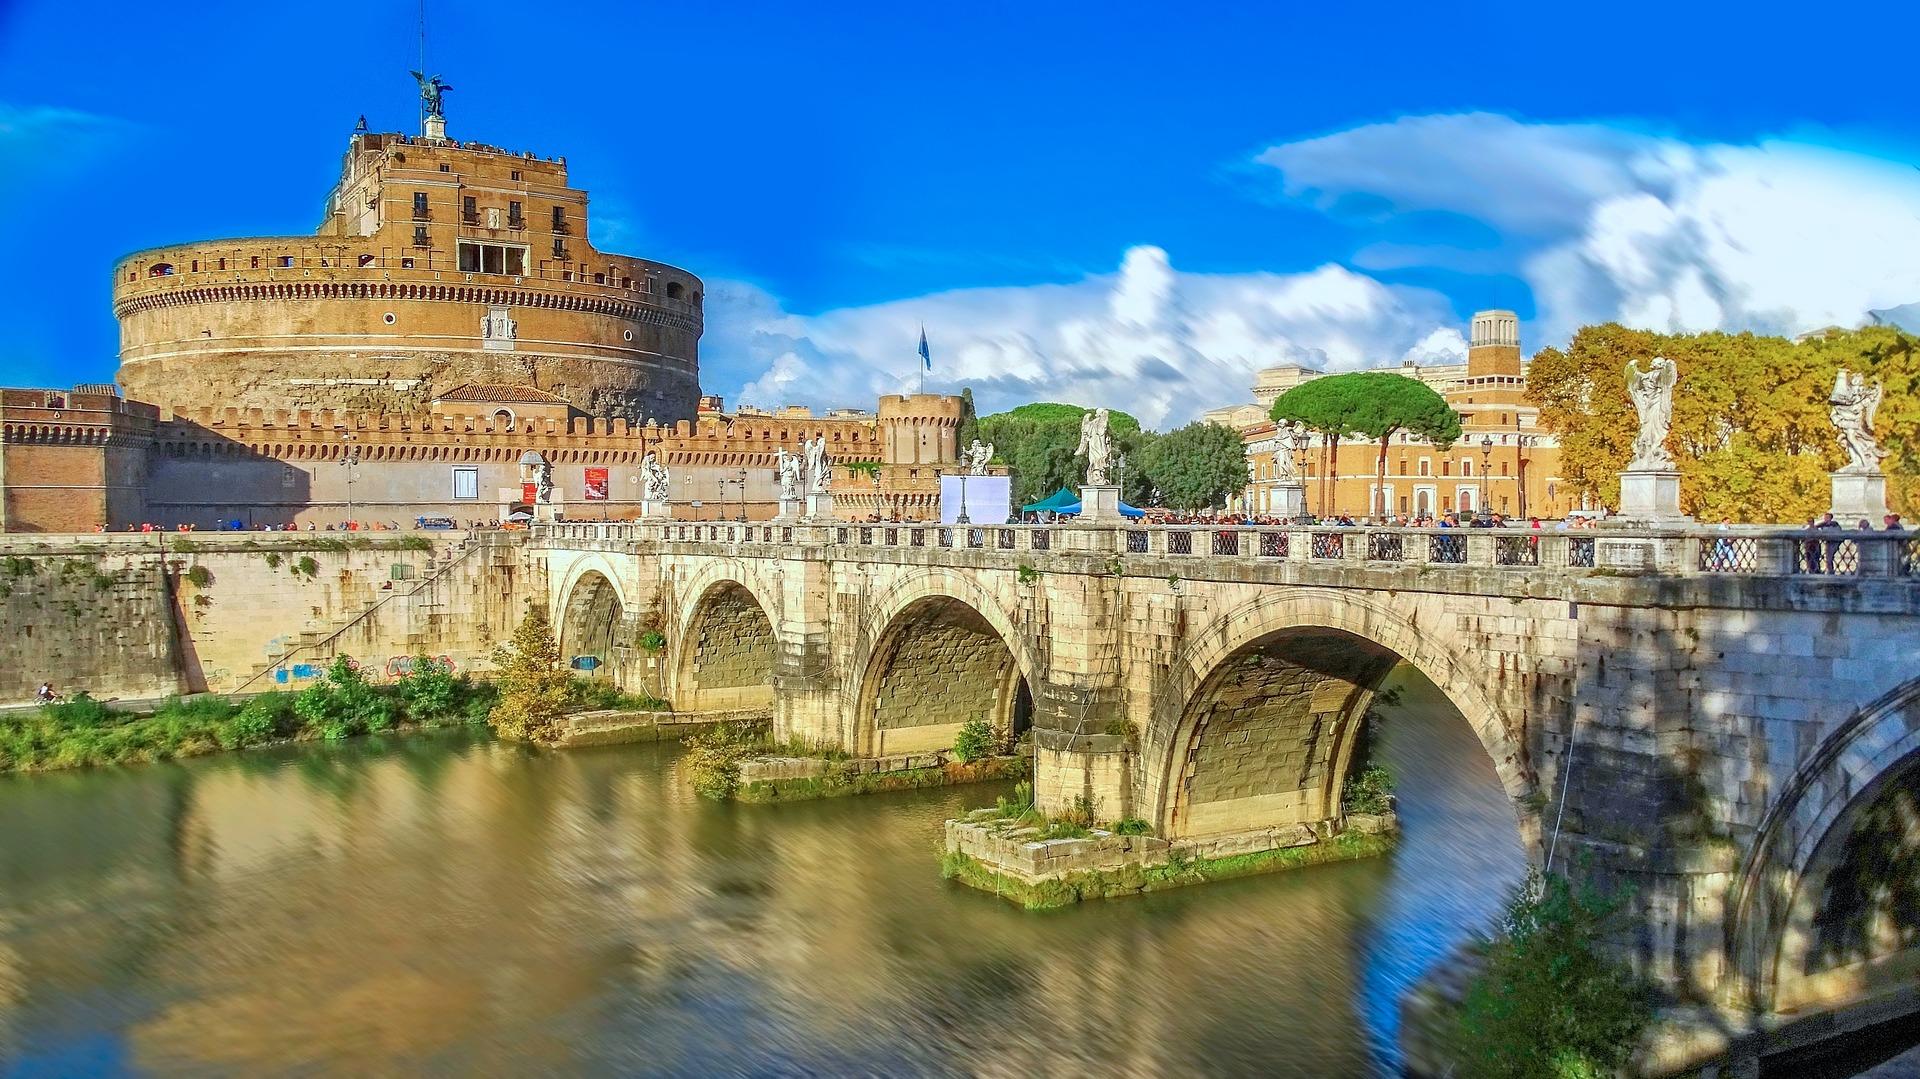 Bridge to the Vatican in Rome, Italy